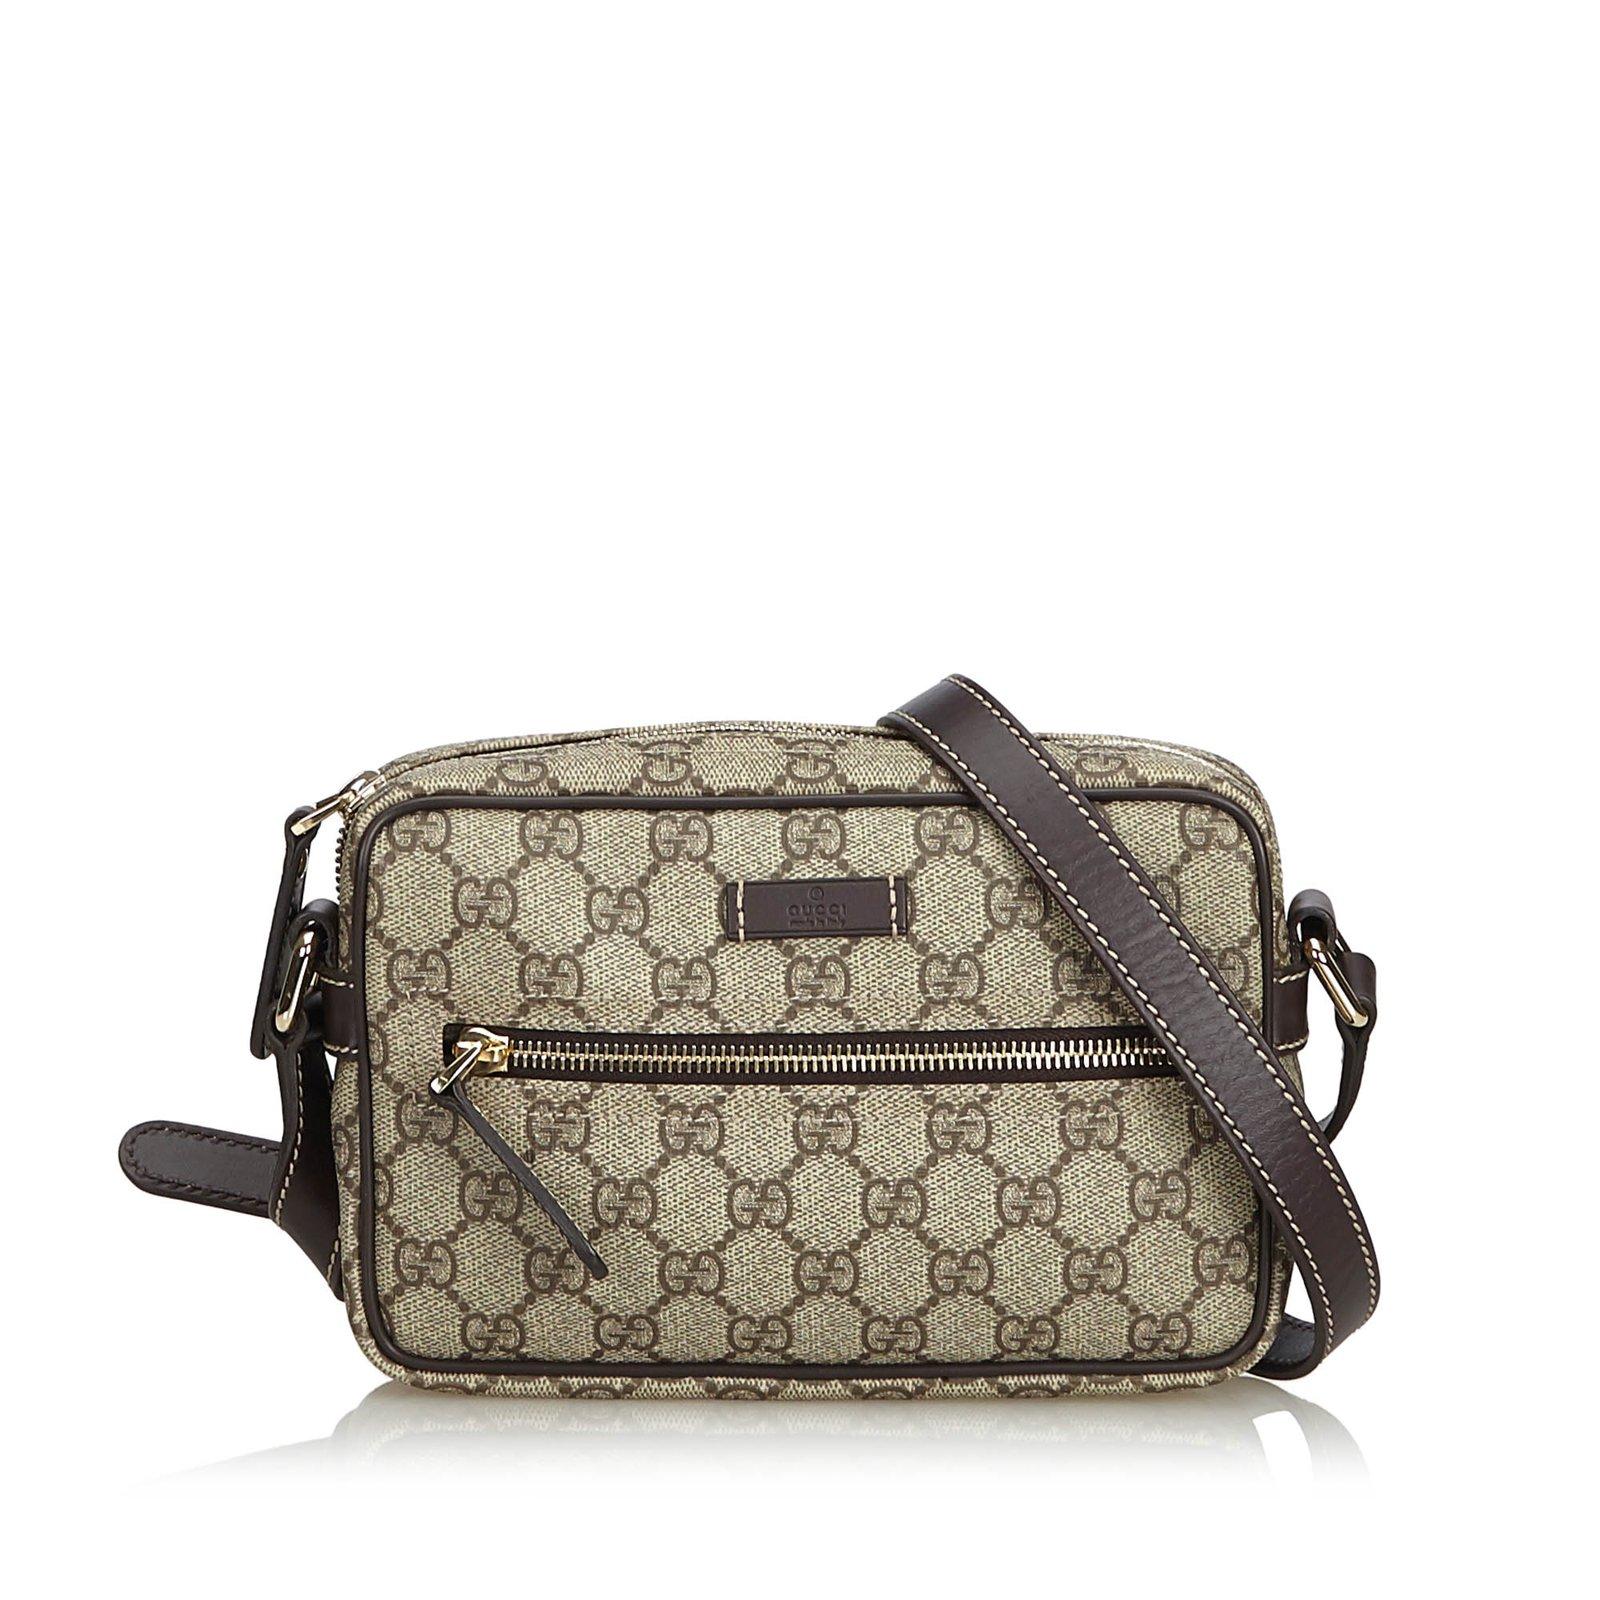 d61133c367f4c5 Gucci Guccissima Crossbody Bag Handbags Leather,Other,Plastic  Brown,Beige,Dark brown